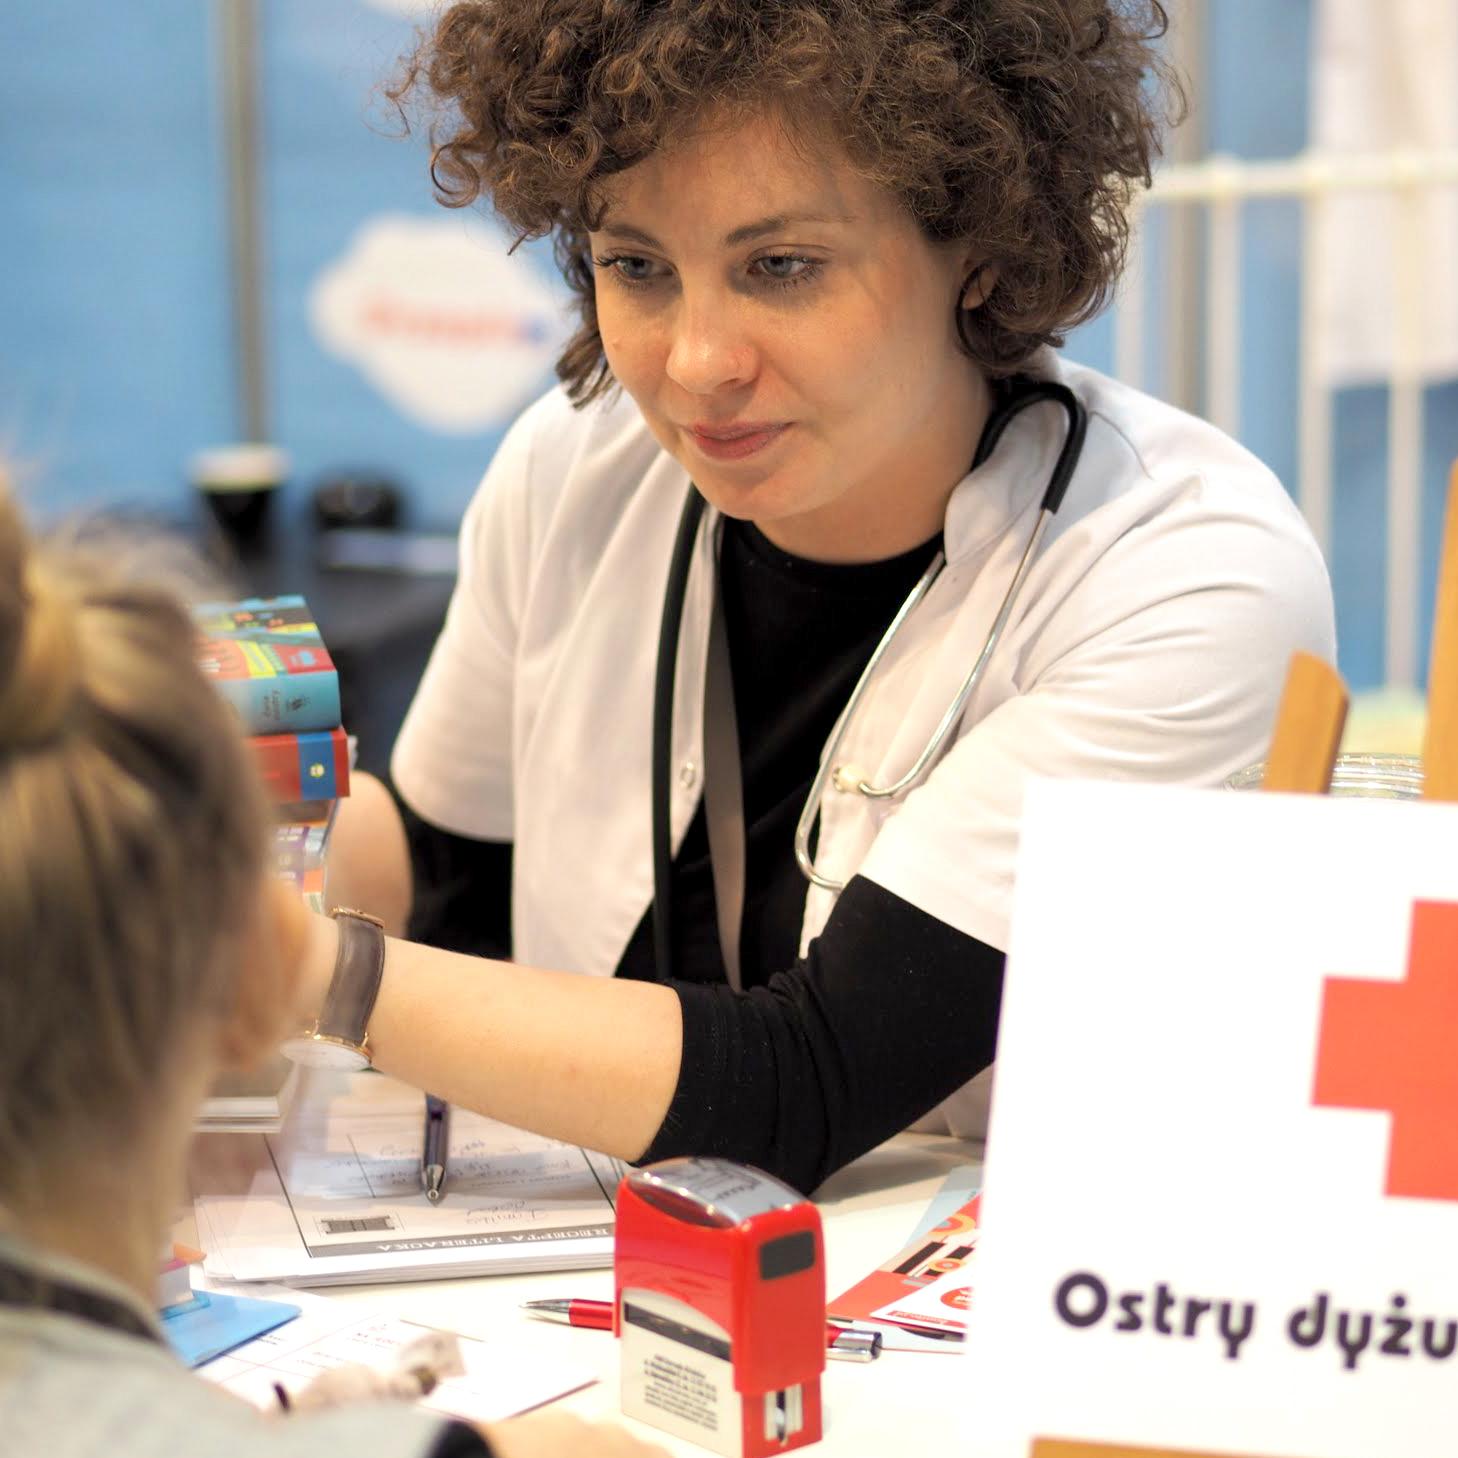 dr. Oliwia Brzeźniak-Pałgan